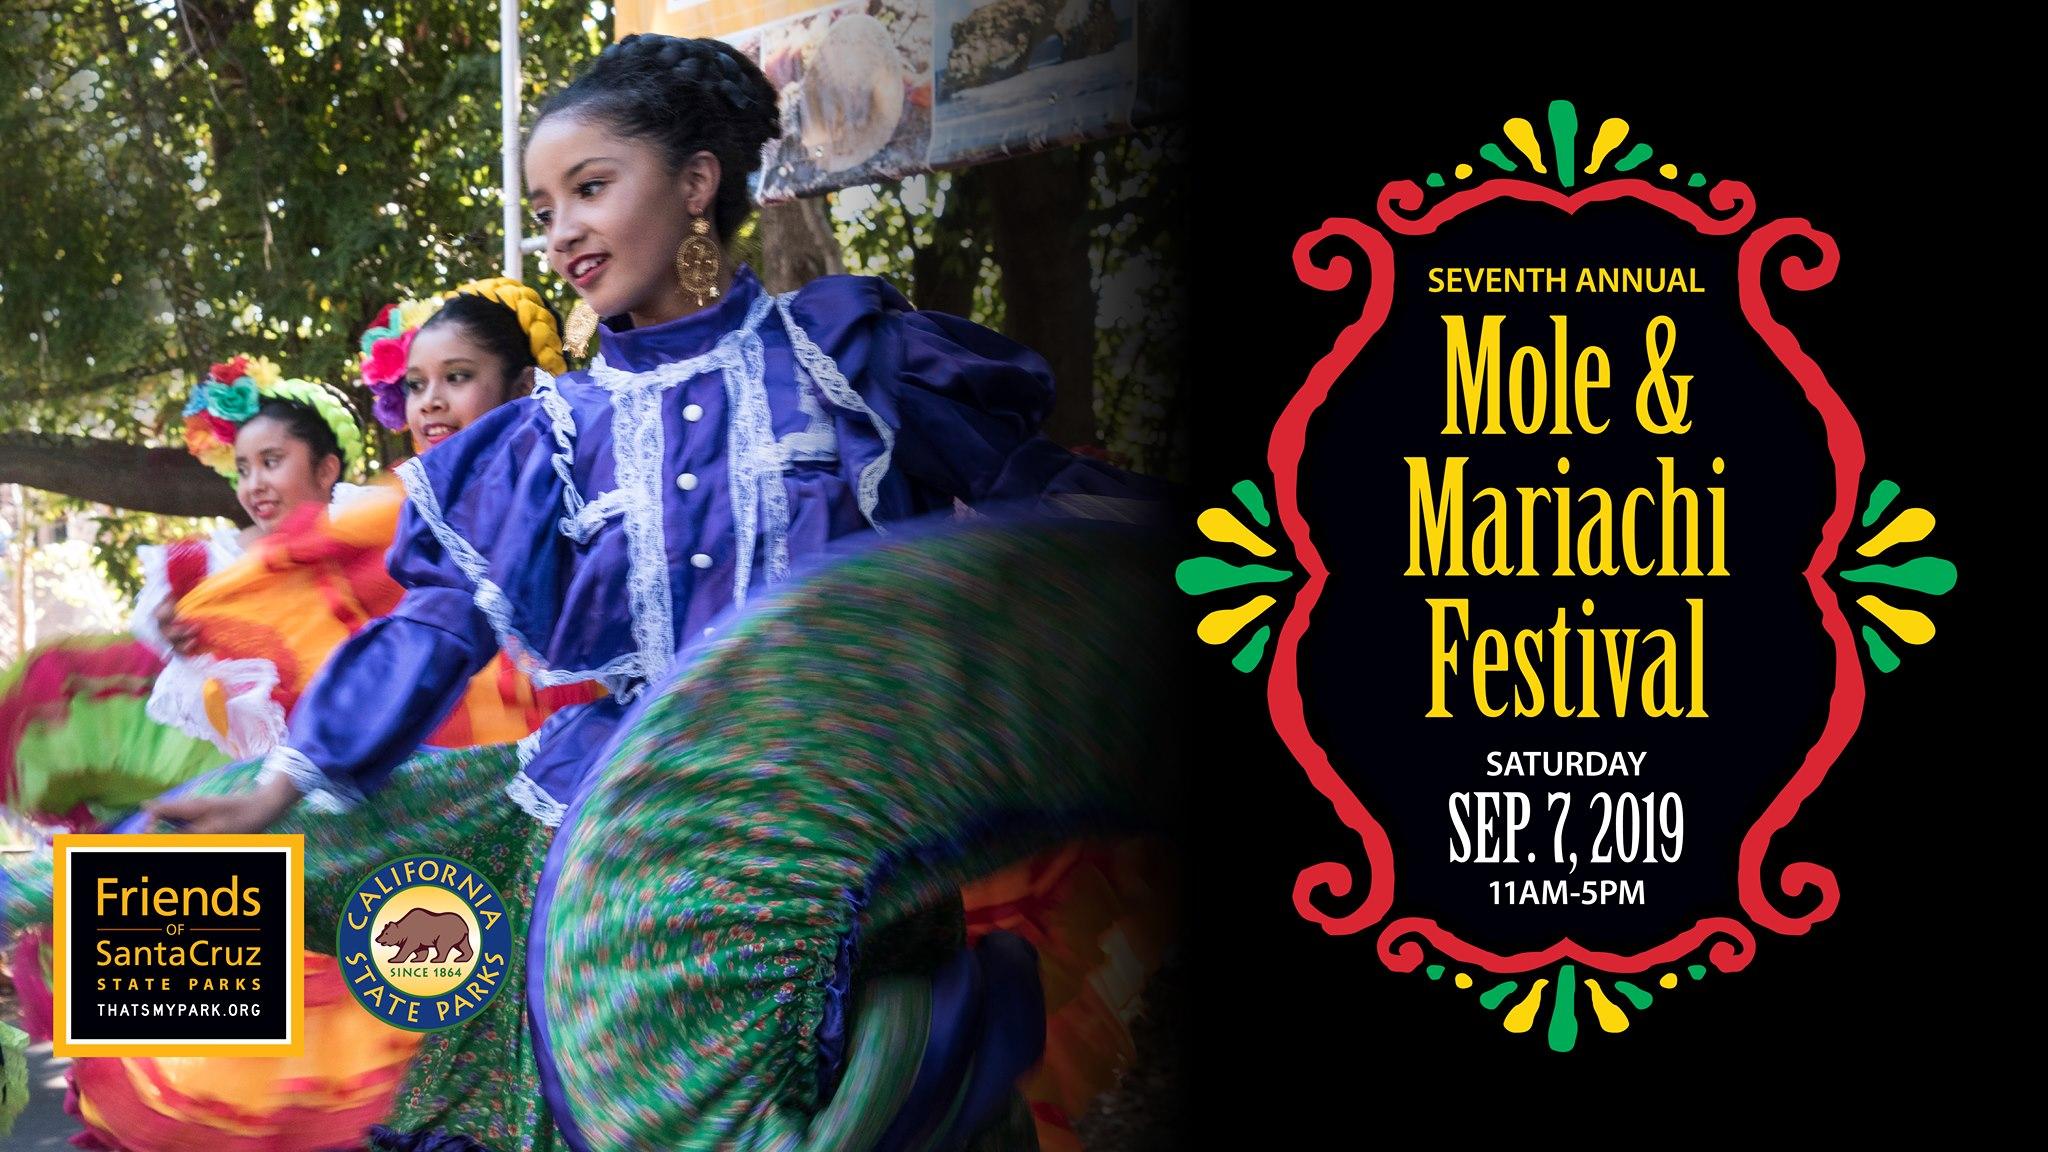 Mole & Mariachi Festival - September 7Santa Cruz State Historic MissionMole & Mariachi Festival has food, beer, wine, craft vendors, giant piñatas, and dancers. Free admission.